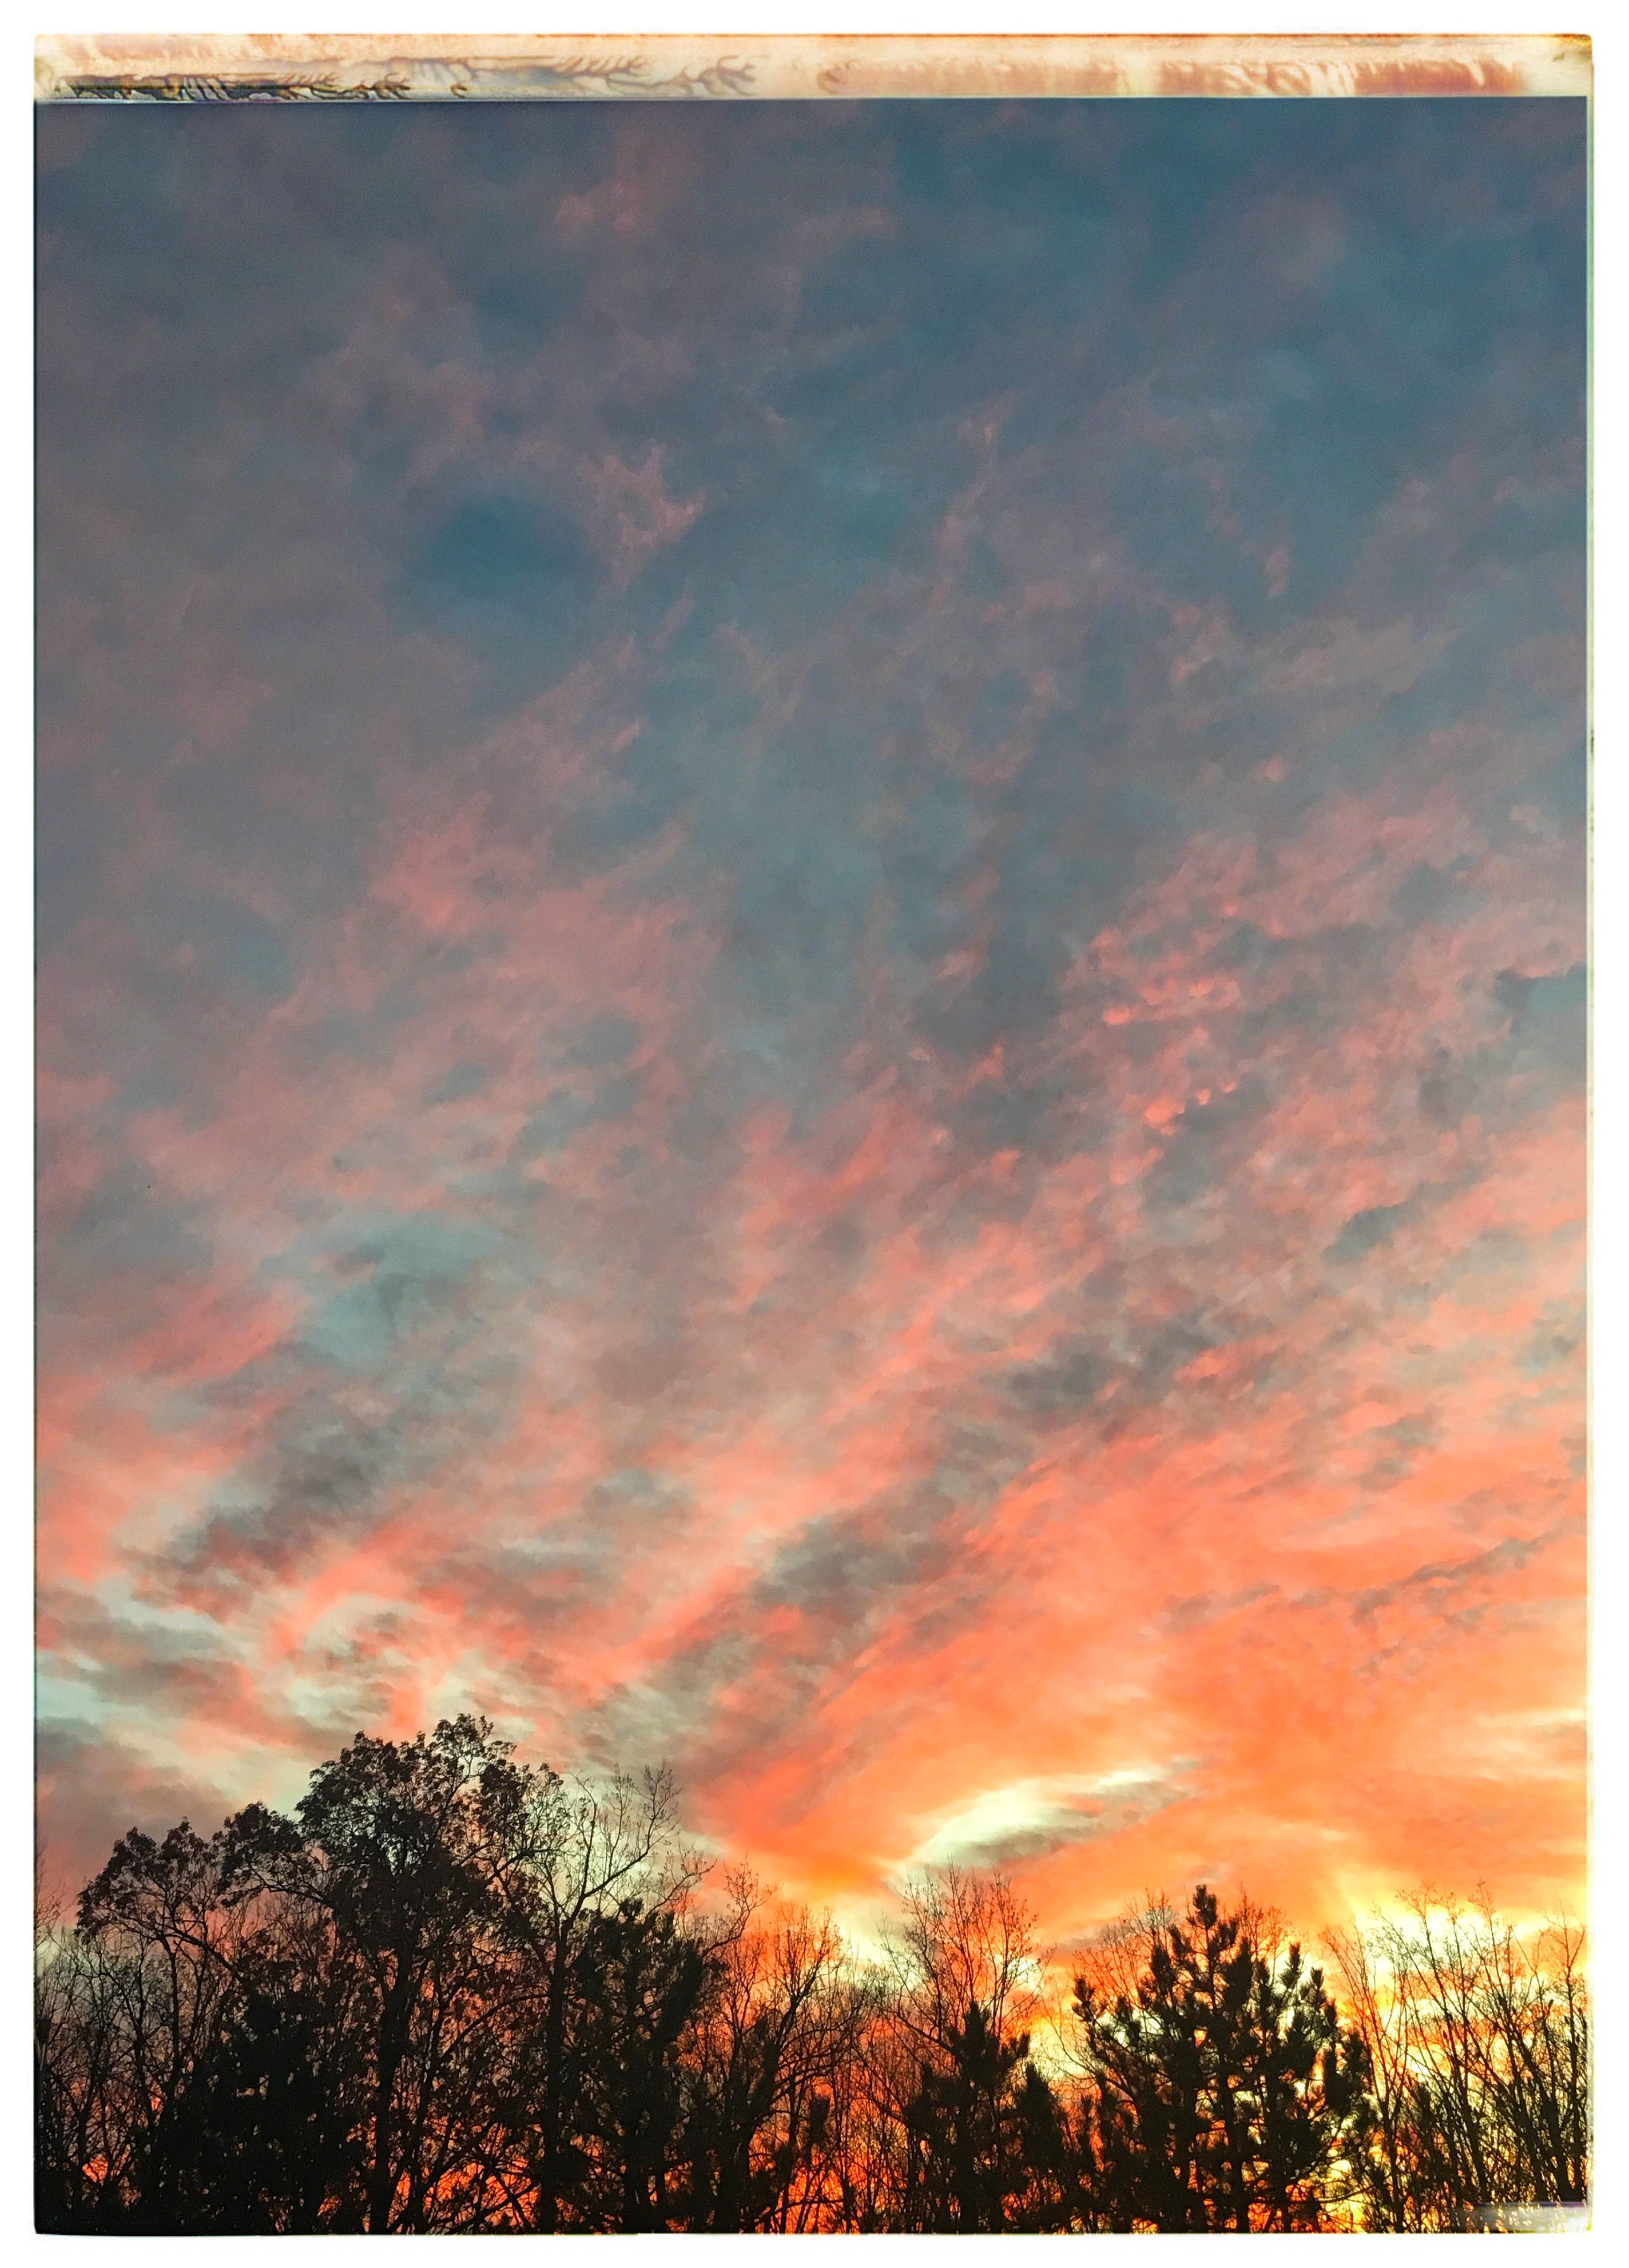 Vertical sunset hirez.jpg